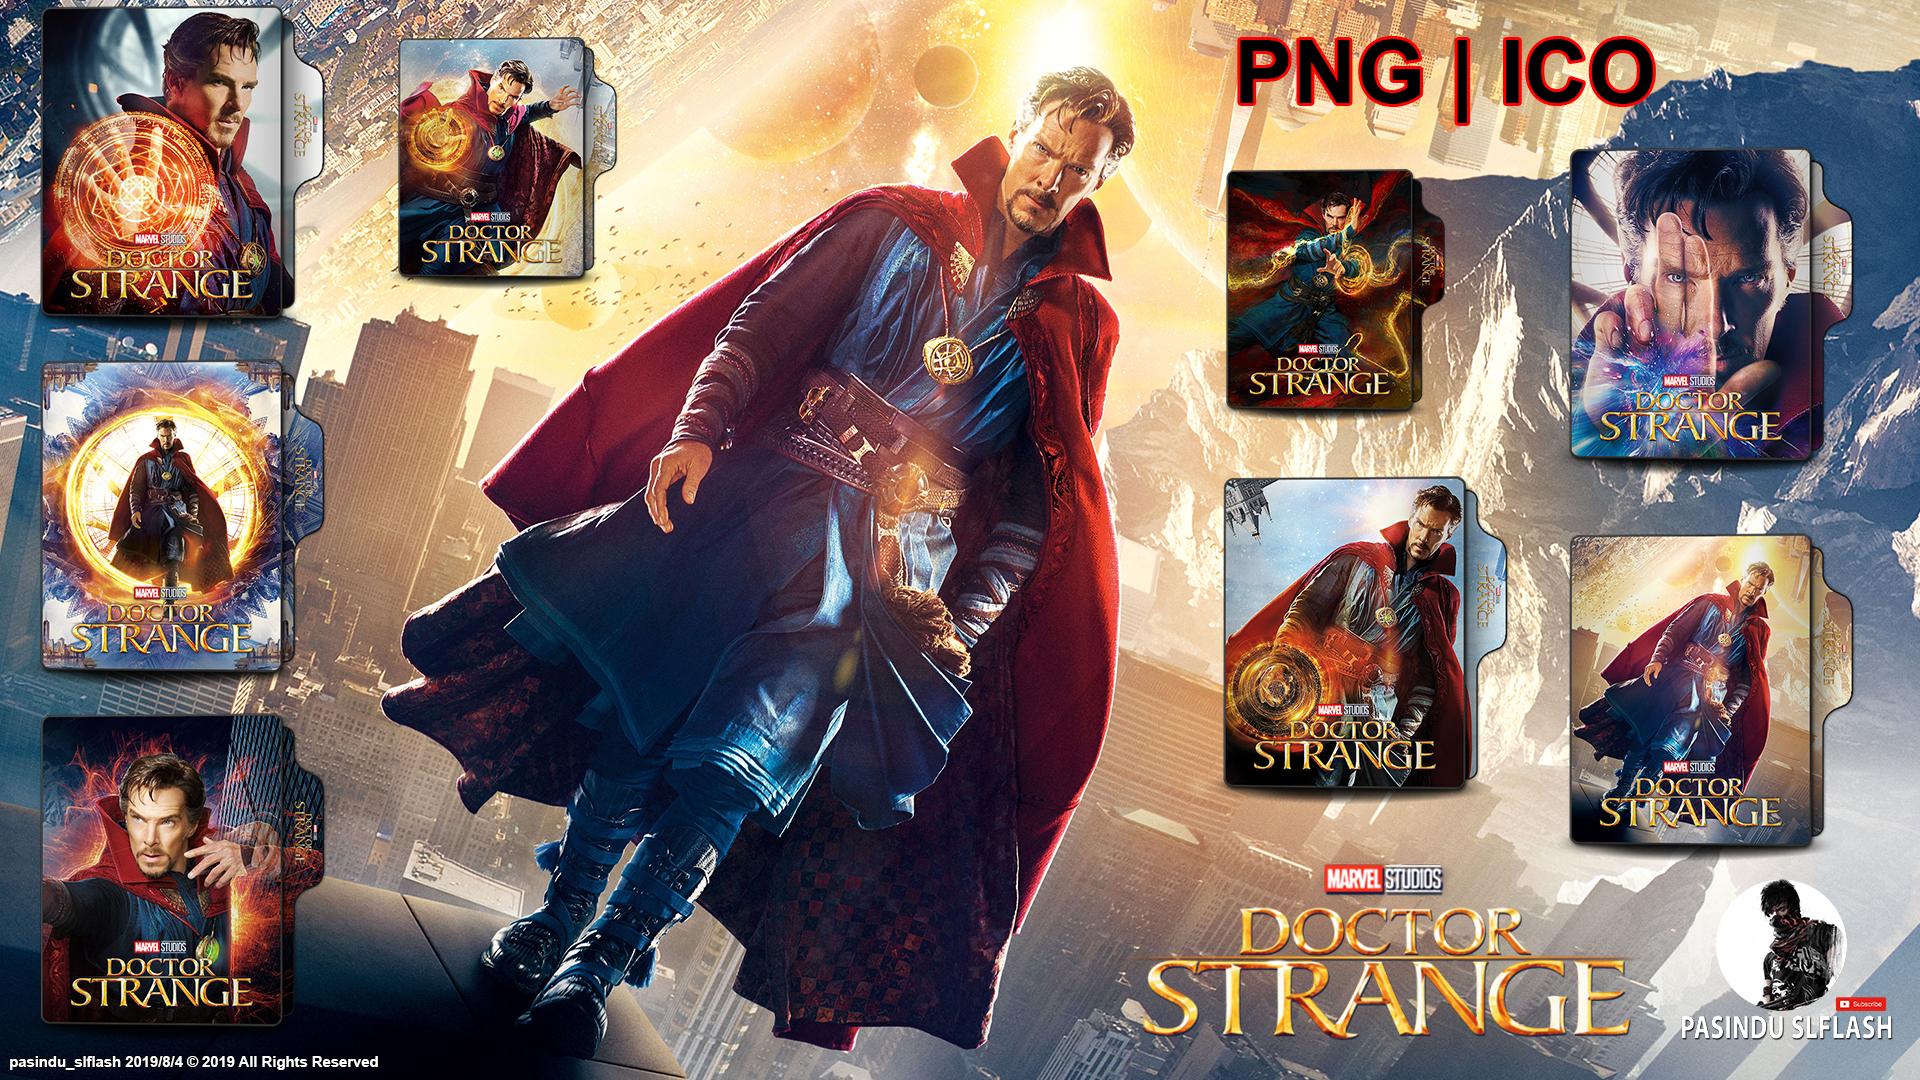 Doctor Strange 2016 Folder Icon Pack By Pasinduslflash On Deviantart